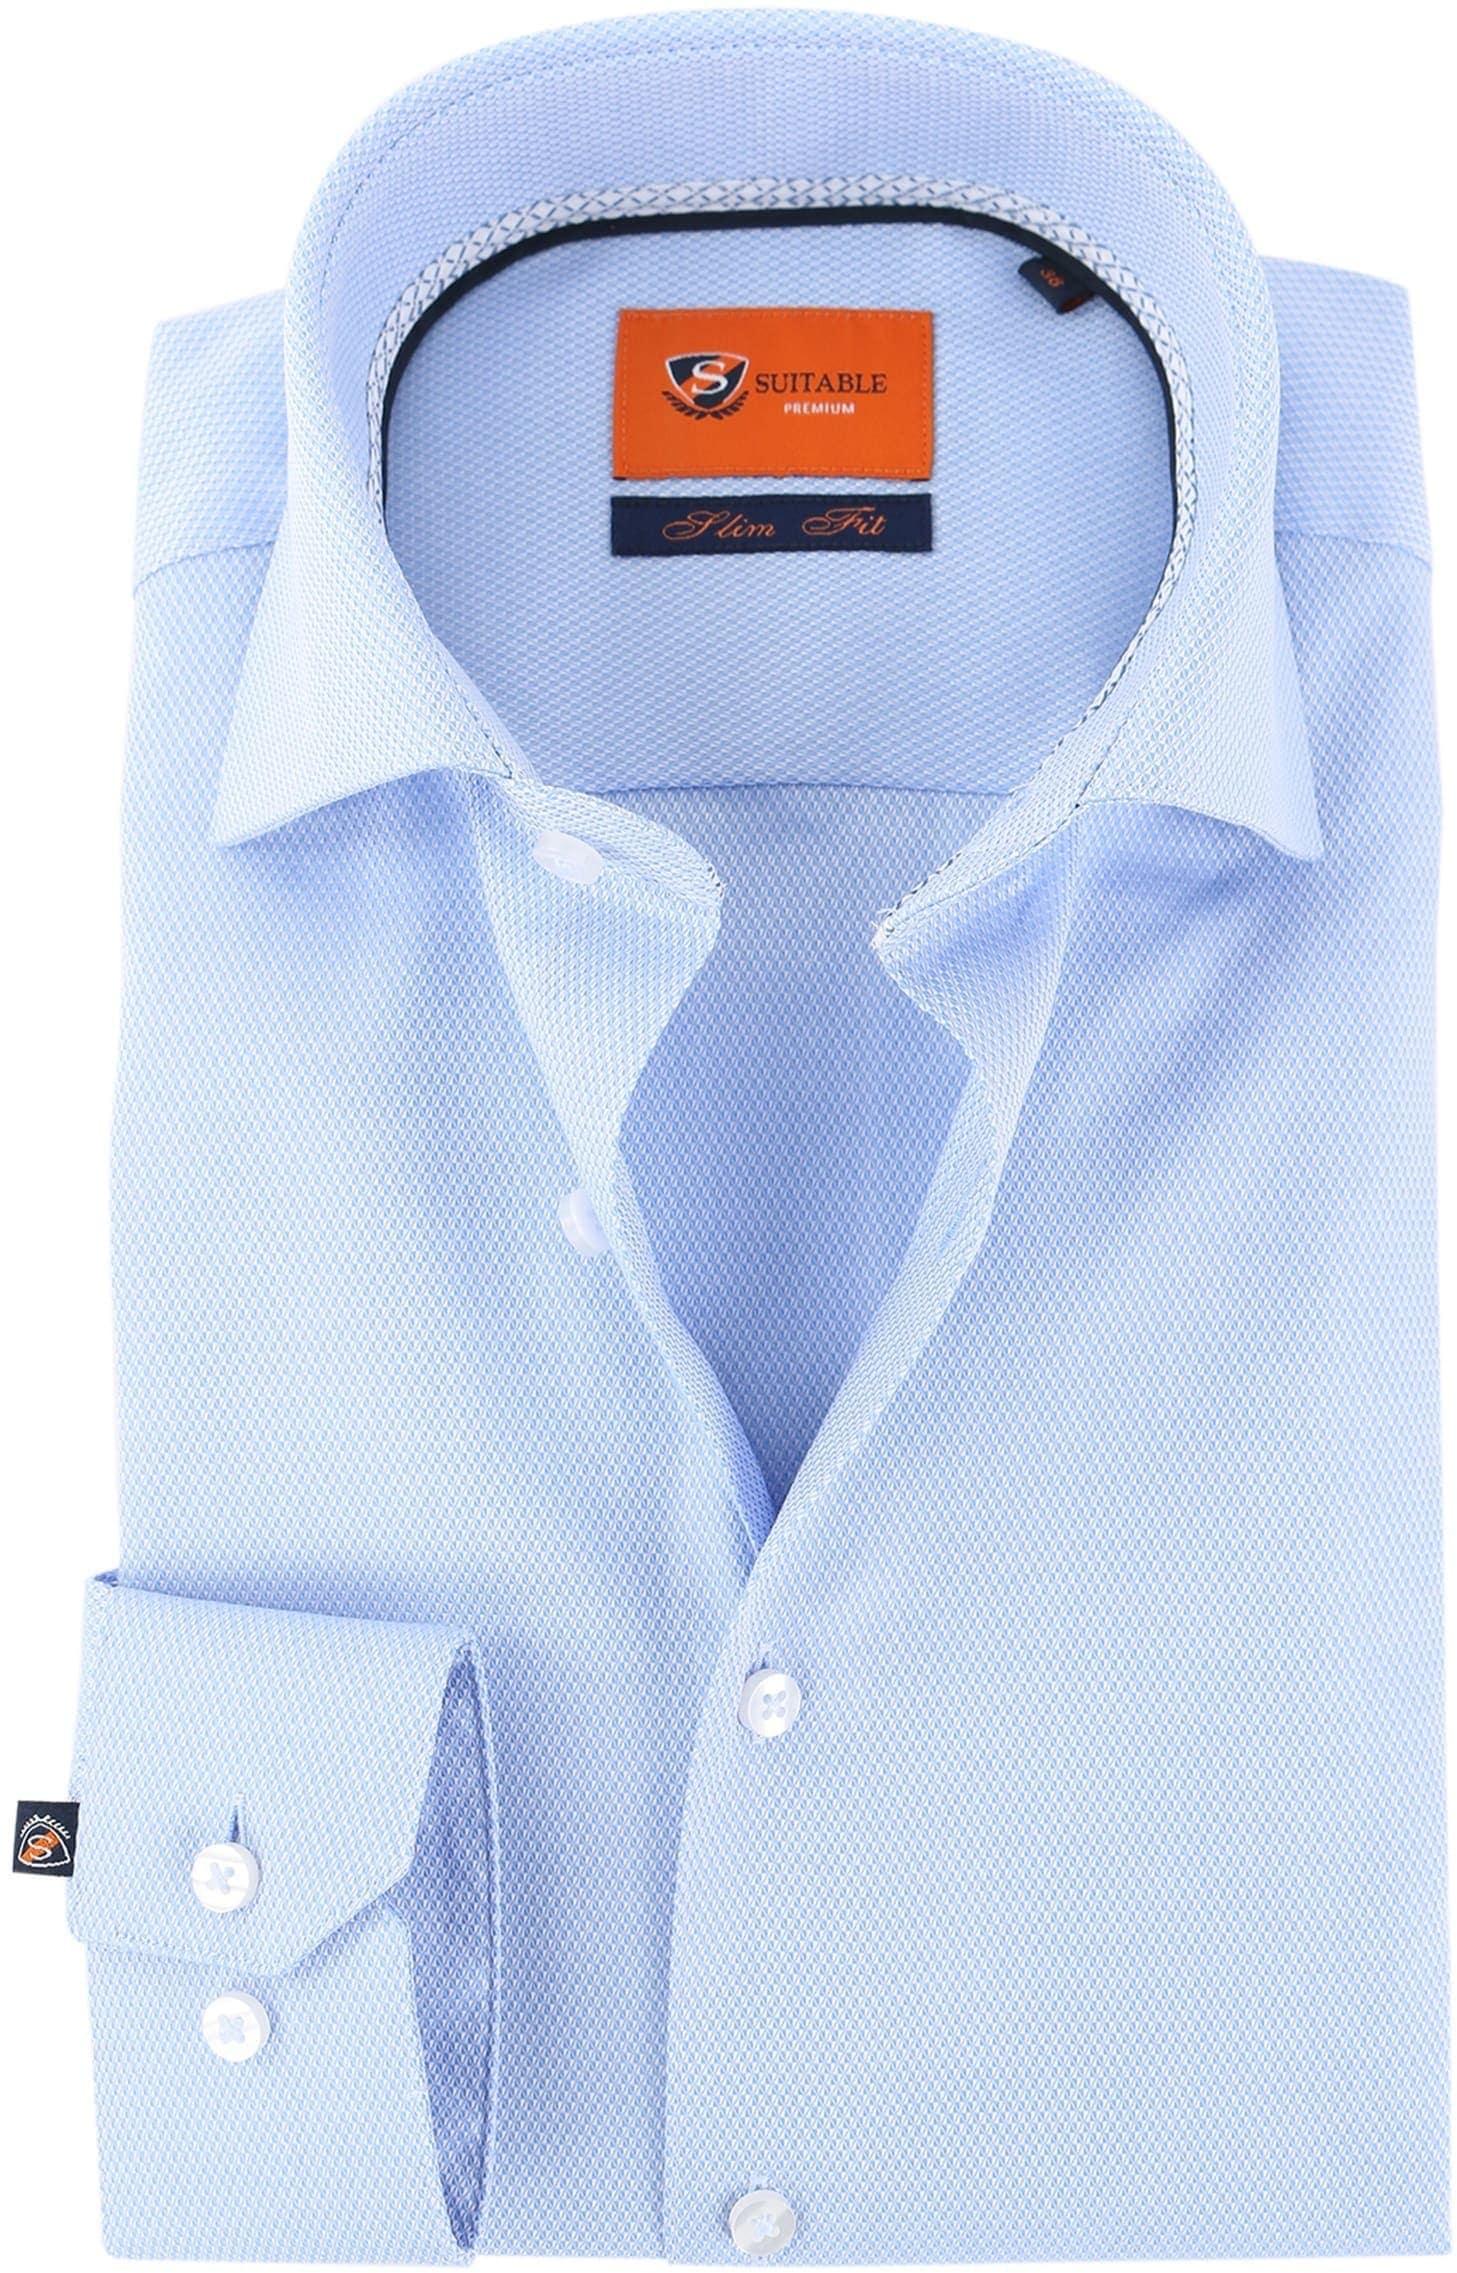 Suitable Overhemd Blue Dessin D71-16 foto 0